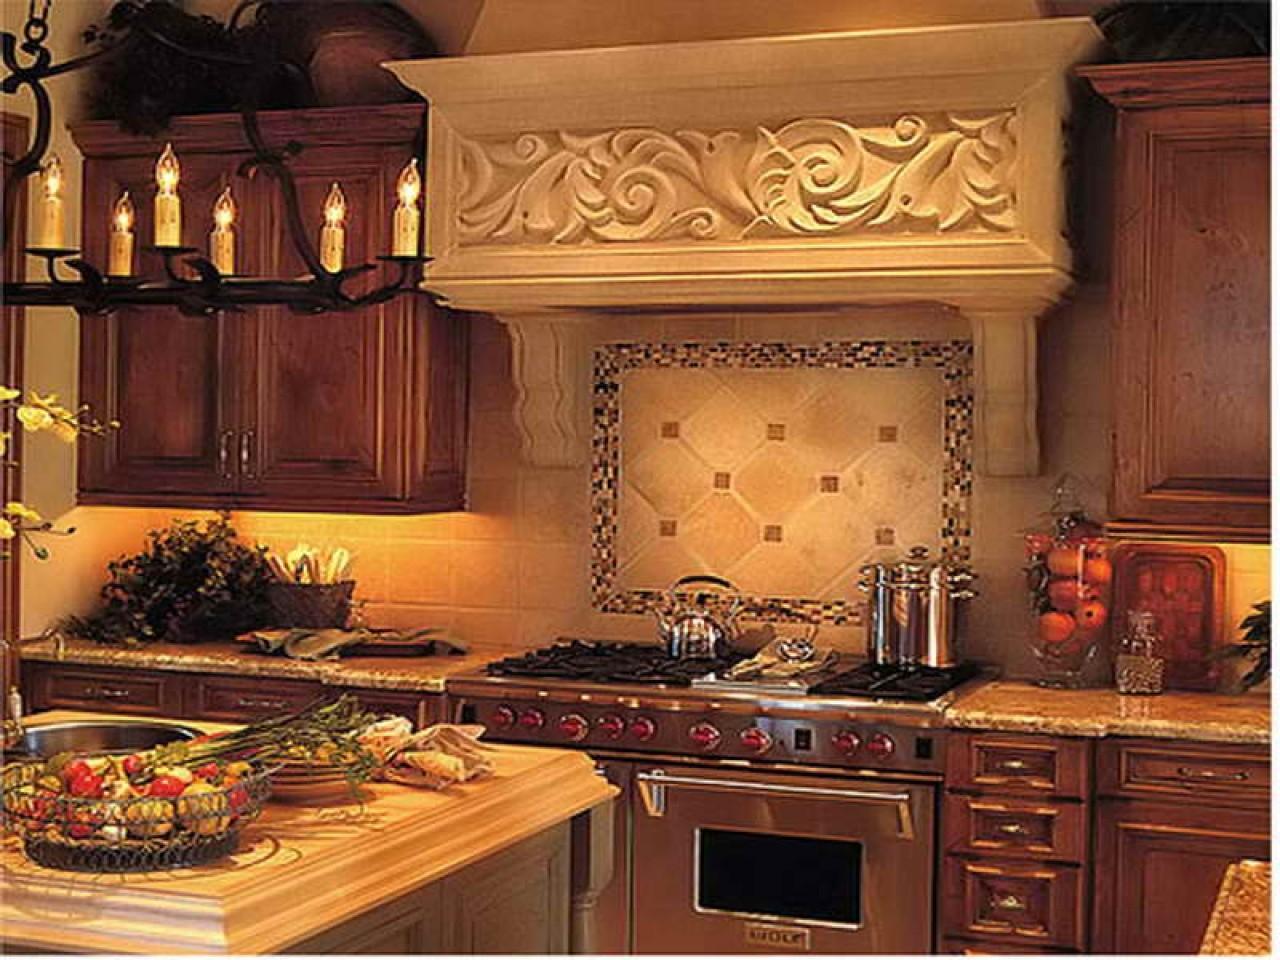 - Rustic Kitchen Backsplash Ideas - Decoratorist - #143393